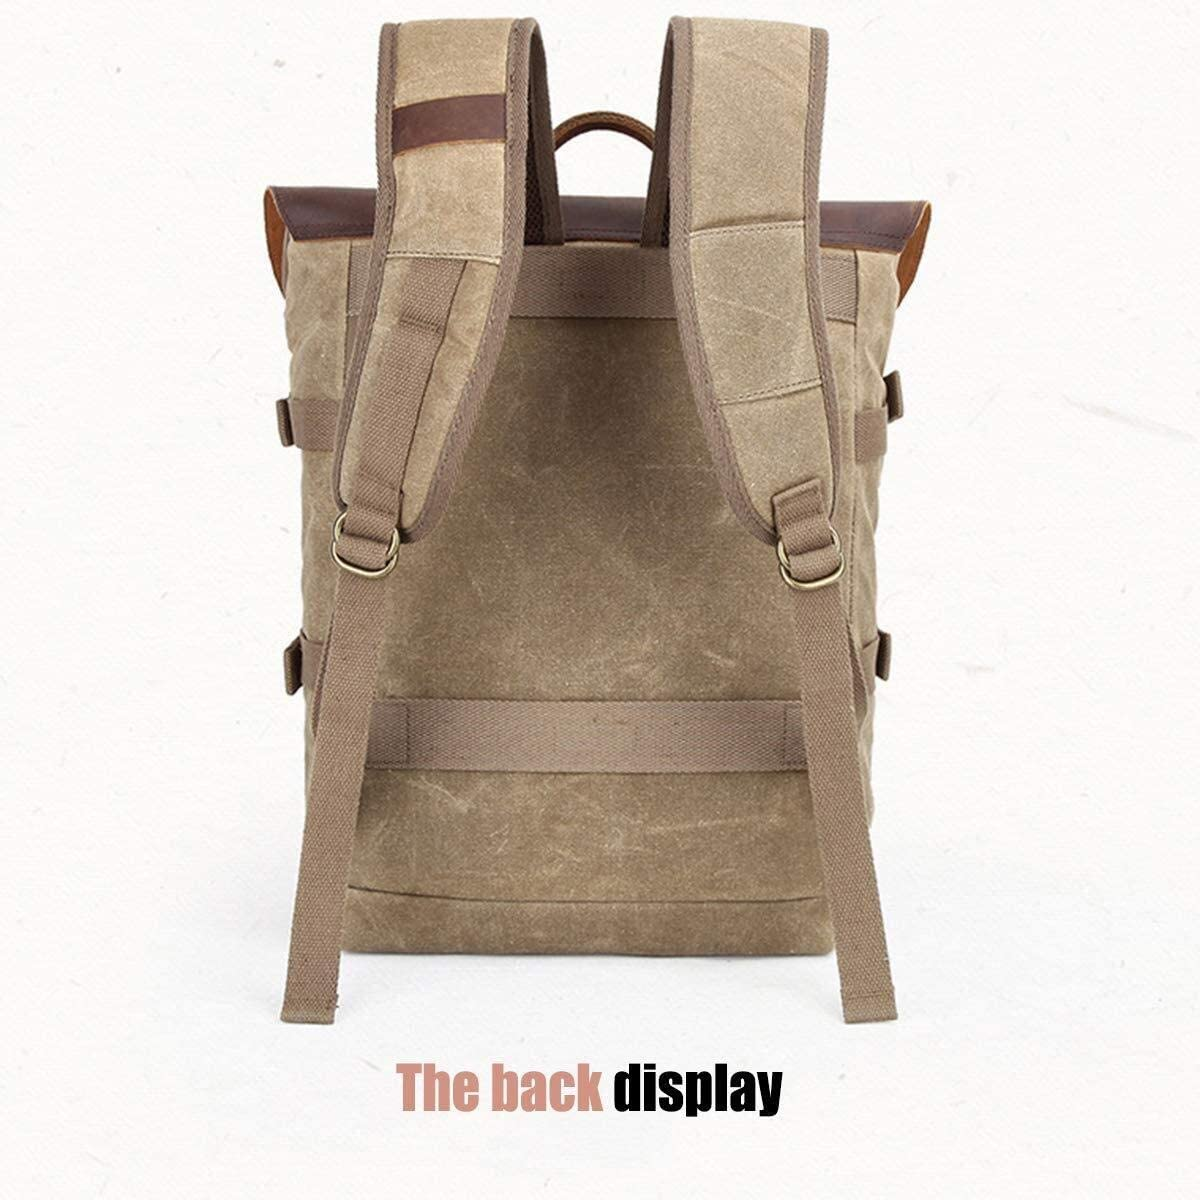 Stylish Multi-Functional Shoulder Camera Bag SLR Camera Bag Casual Travel Bag Batik Canvas Retro Fashion Digital Camera Collection Backpack Sports Backpack